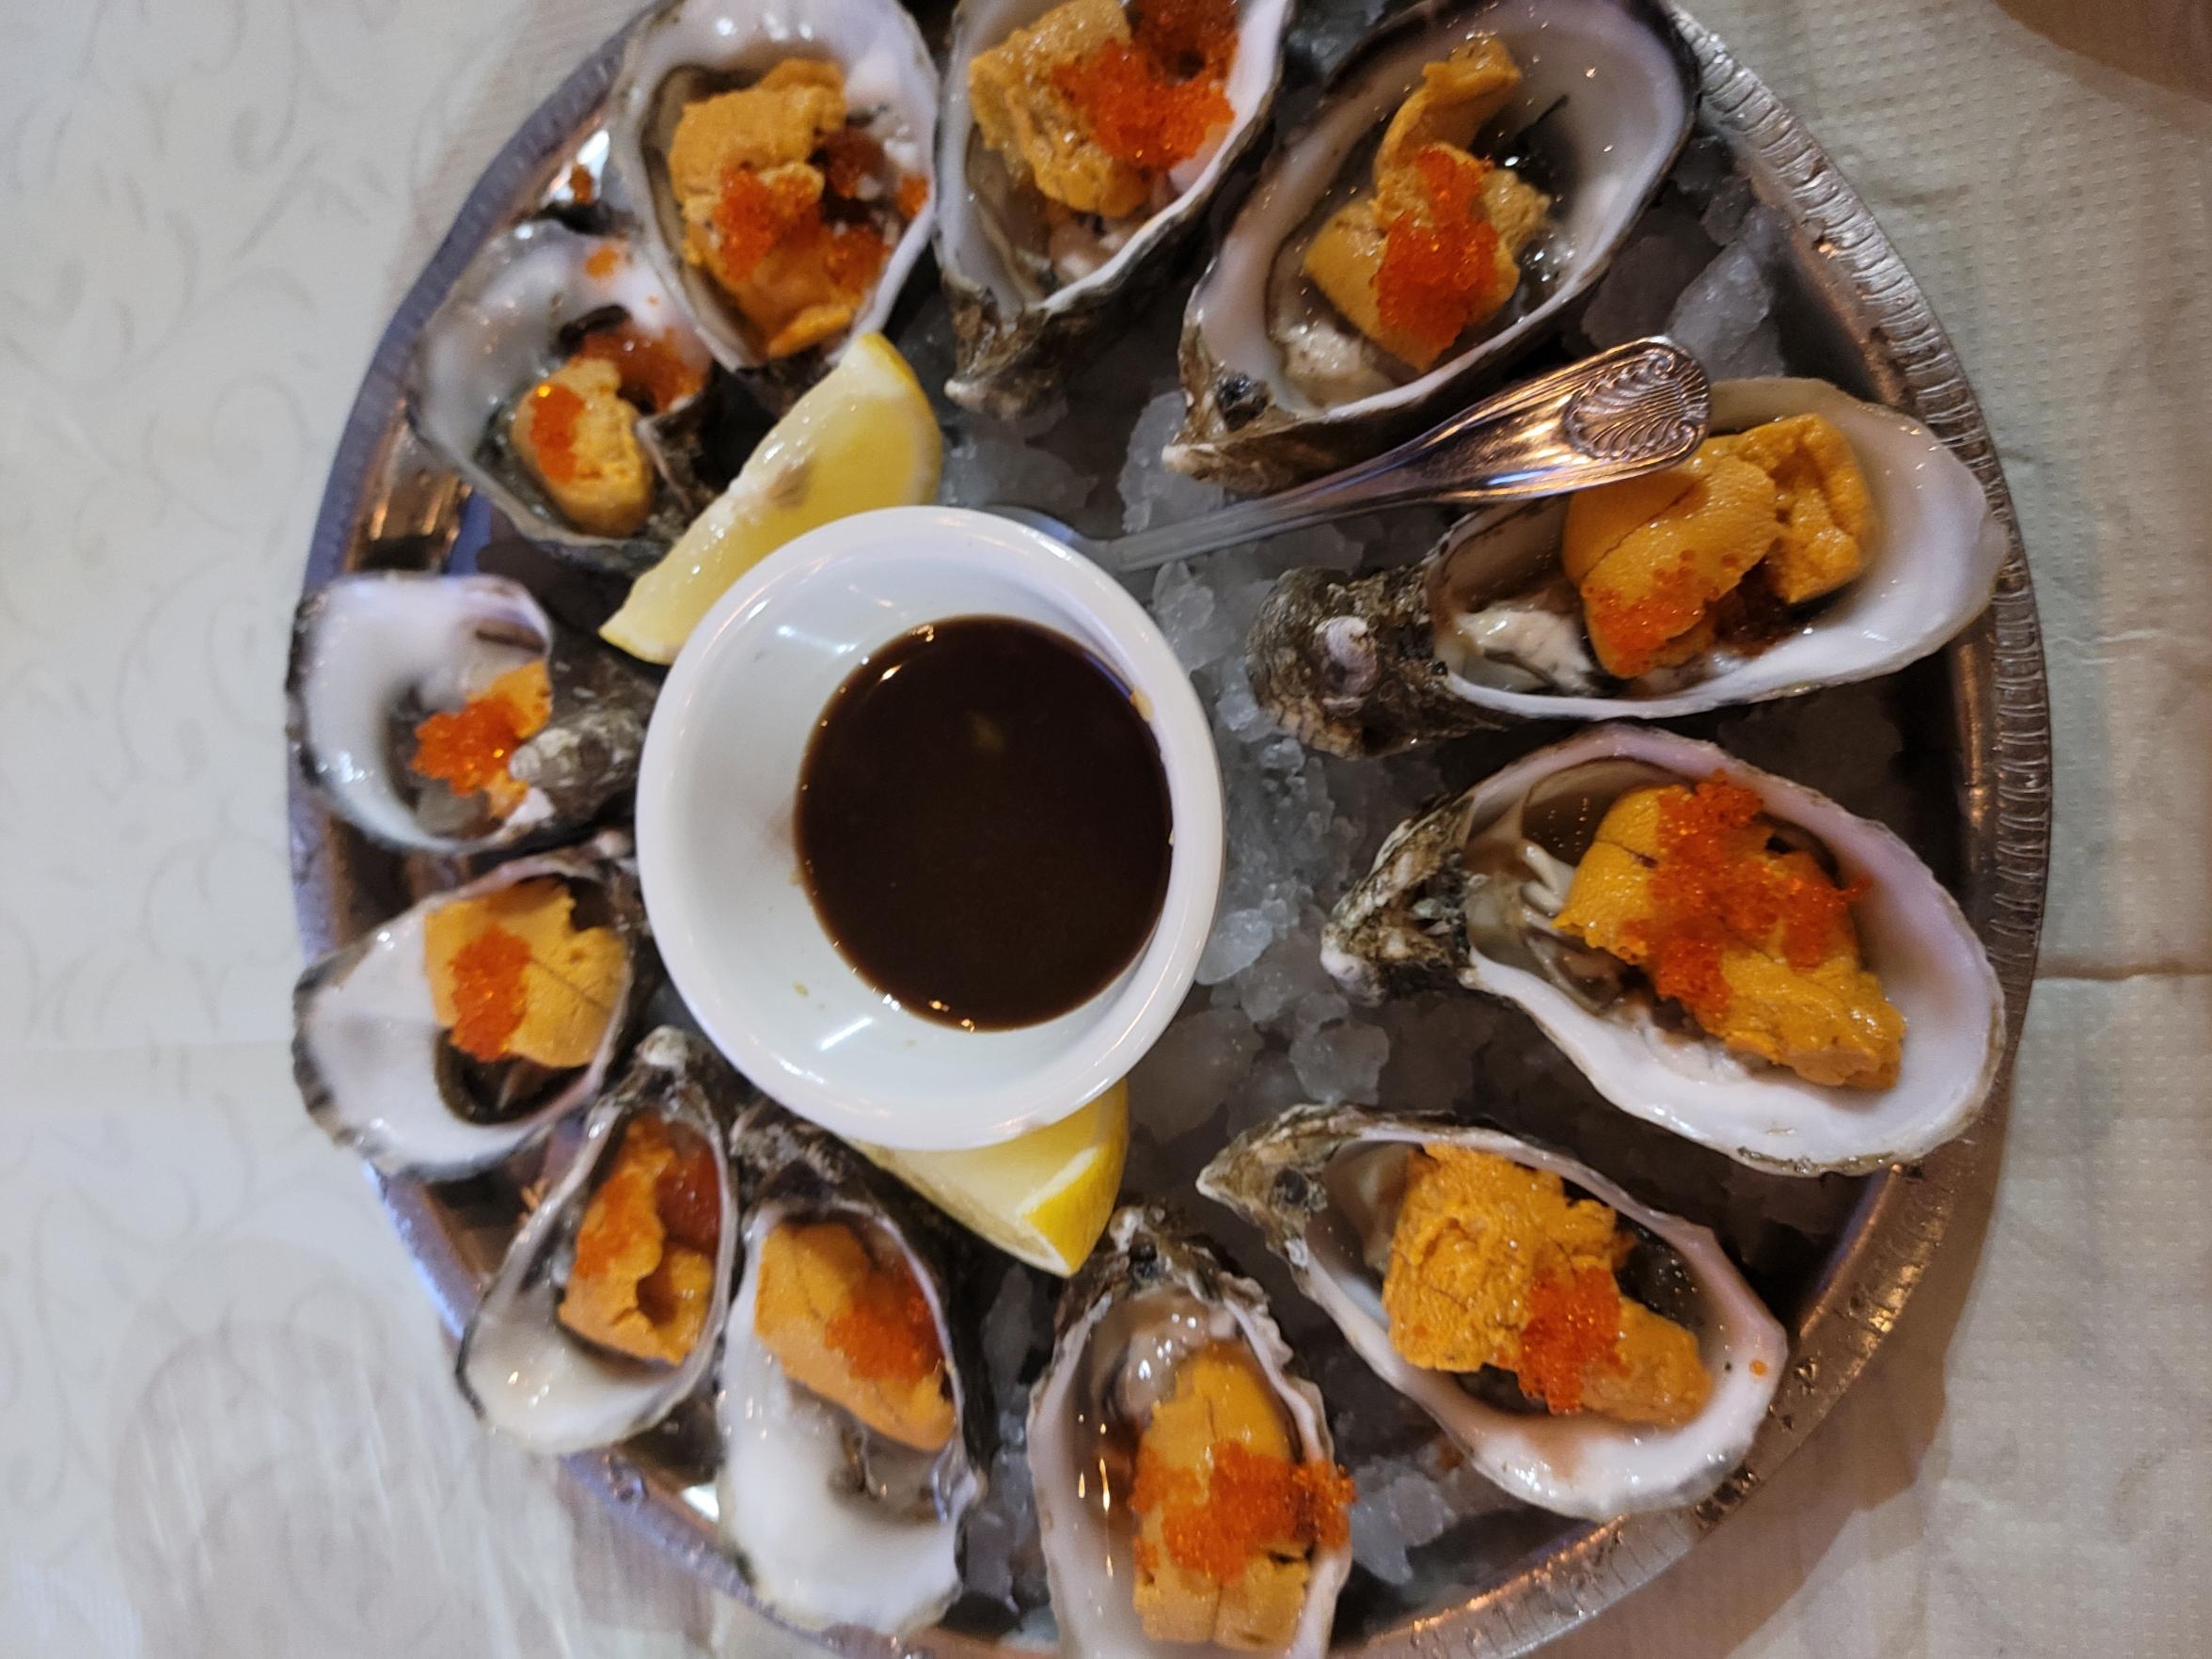 tobiko uni oysters